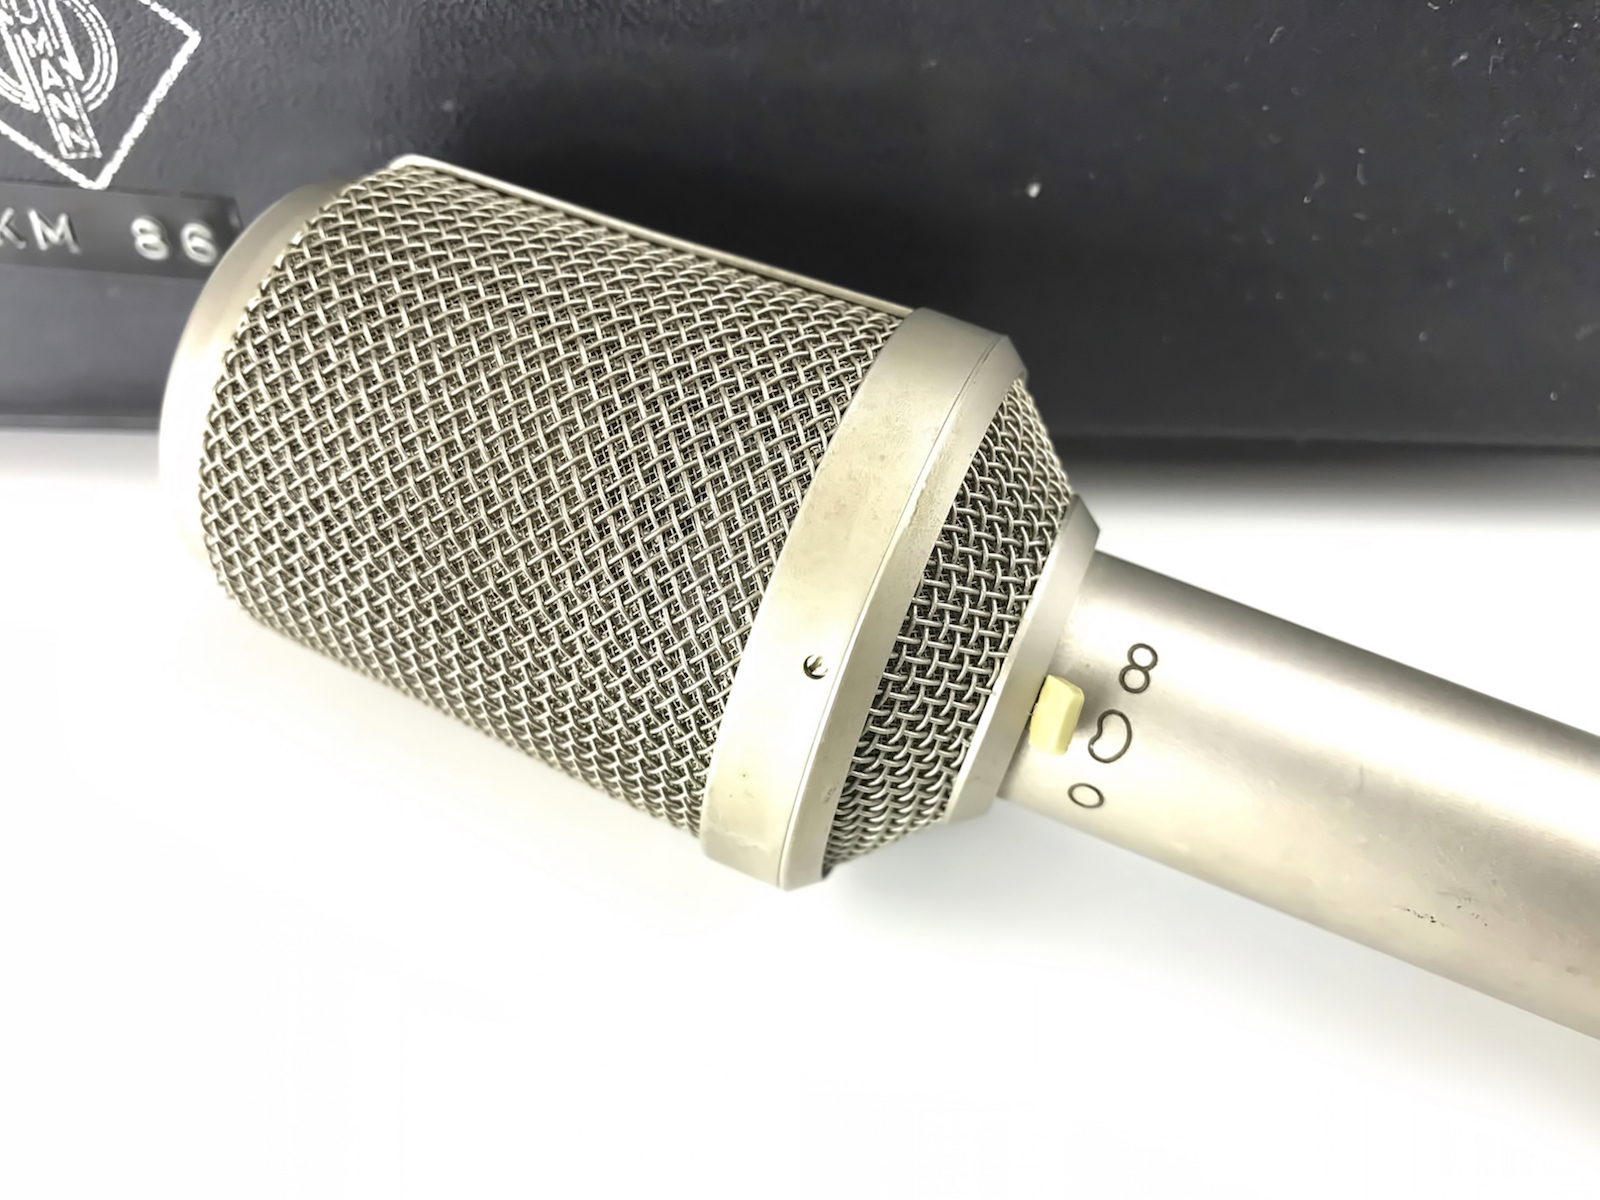 Diagram On Condenser Mic Patterns Wiring Diagrams Microphone Schematic Vintagetools Shop Neumann Km 86 Vintage